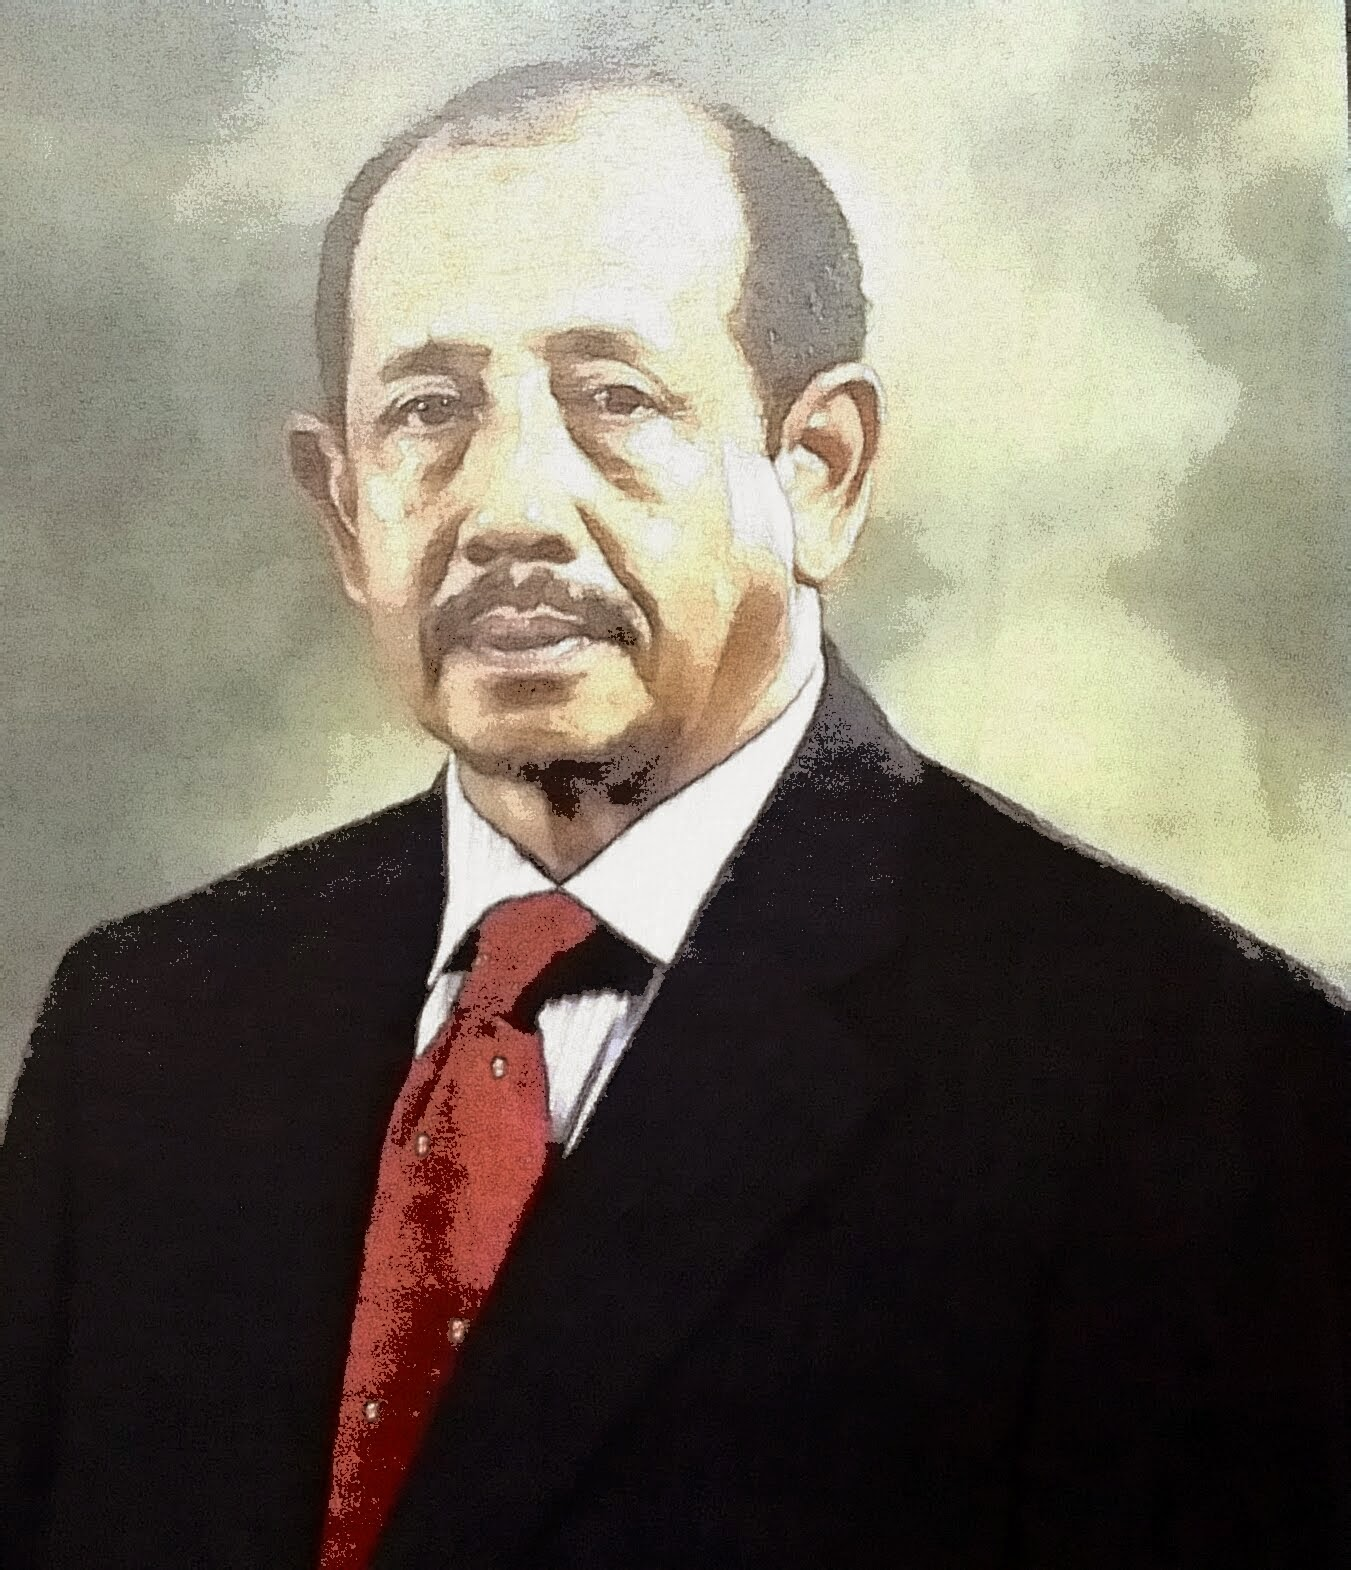 Dato' Hj. Mat Noh b. Ahmad